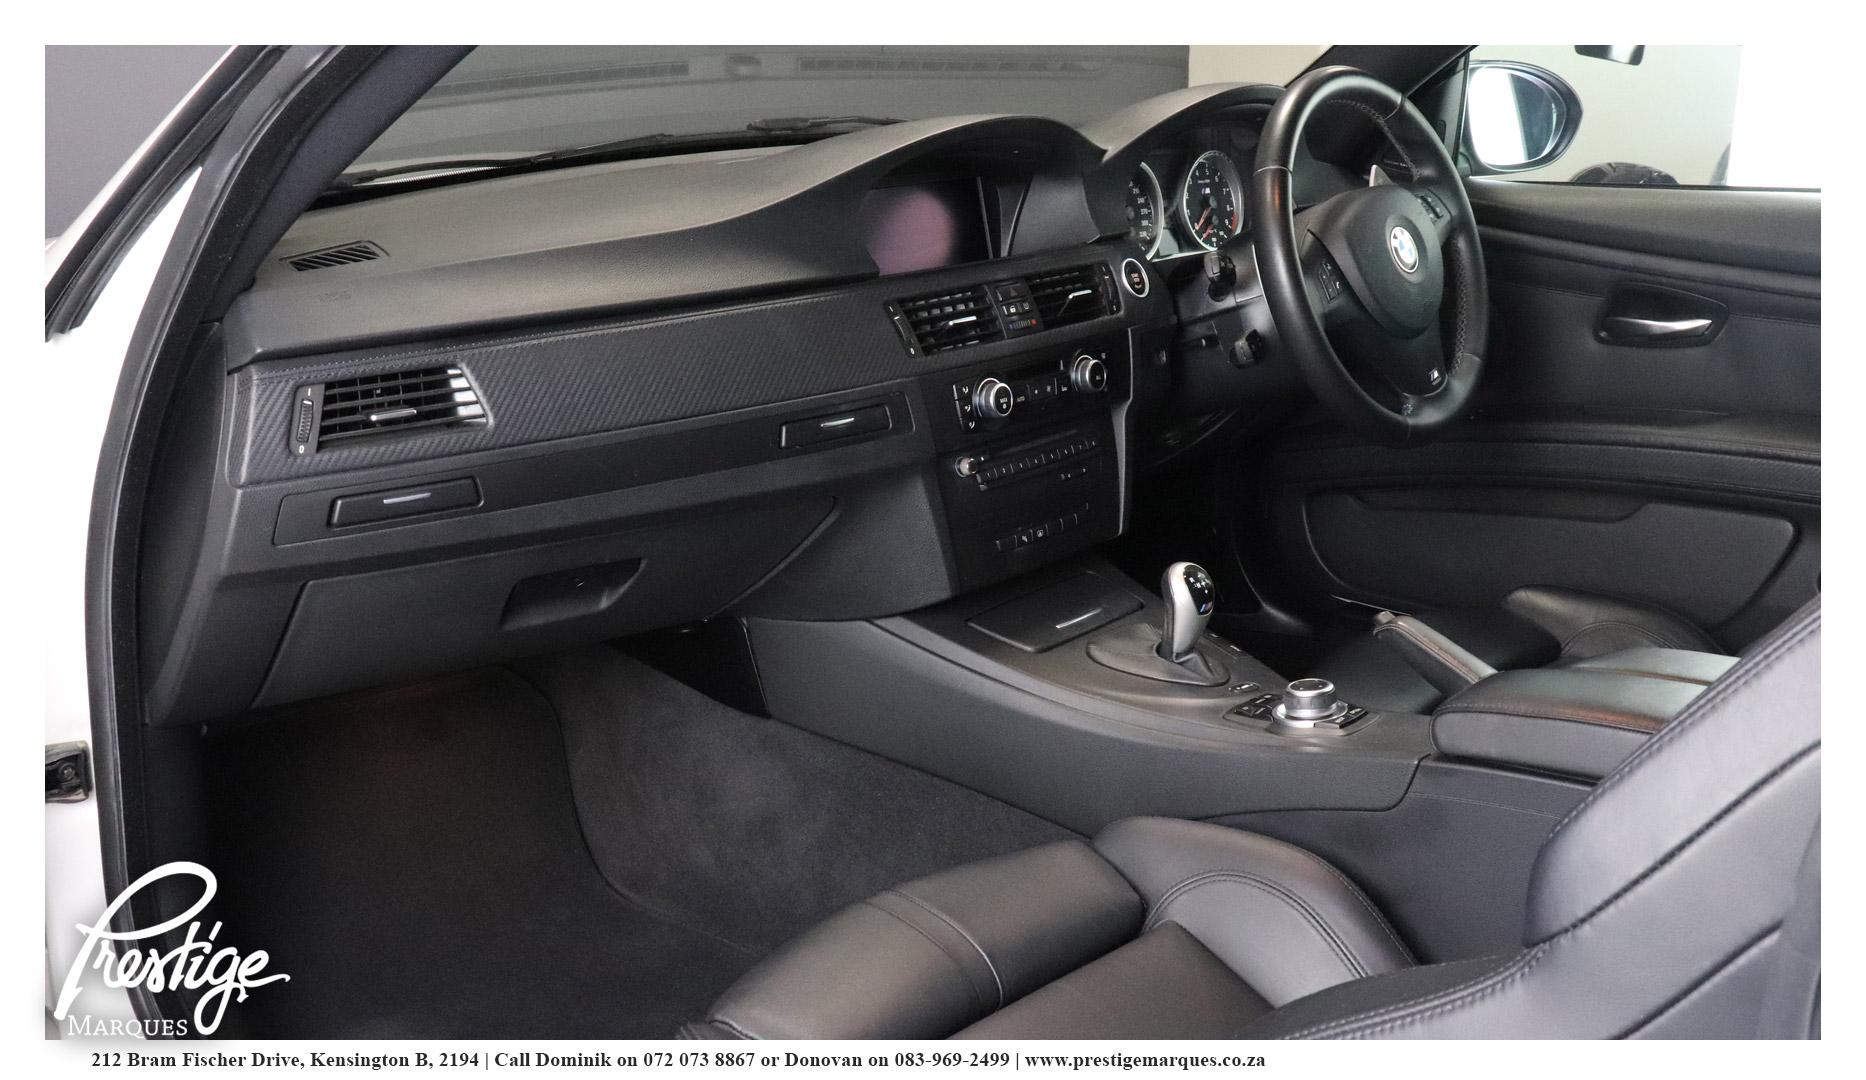 2011-BMW-E92-M3-MDCT-Competition-Package-Prestige-Marques-Randburg-Sandton-11